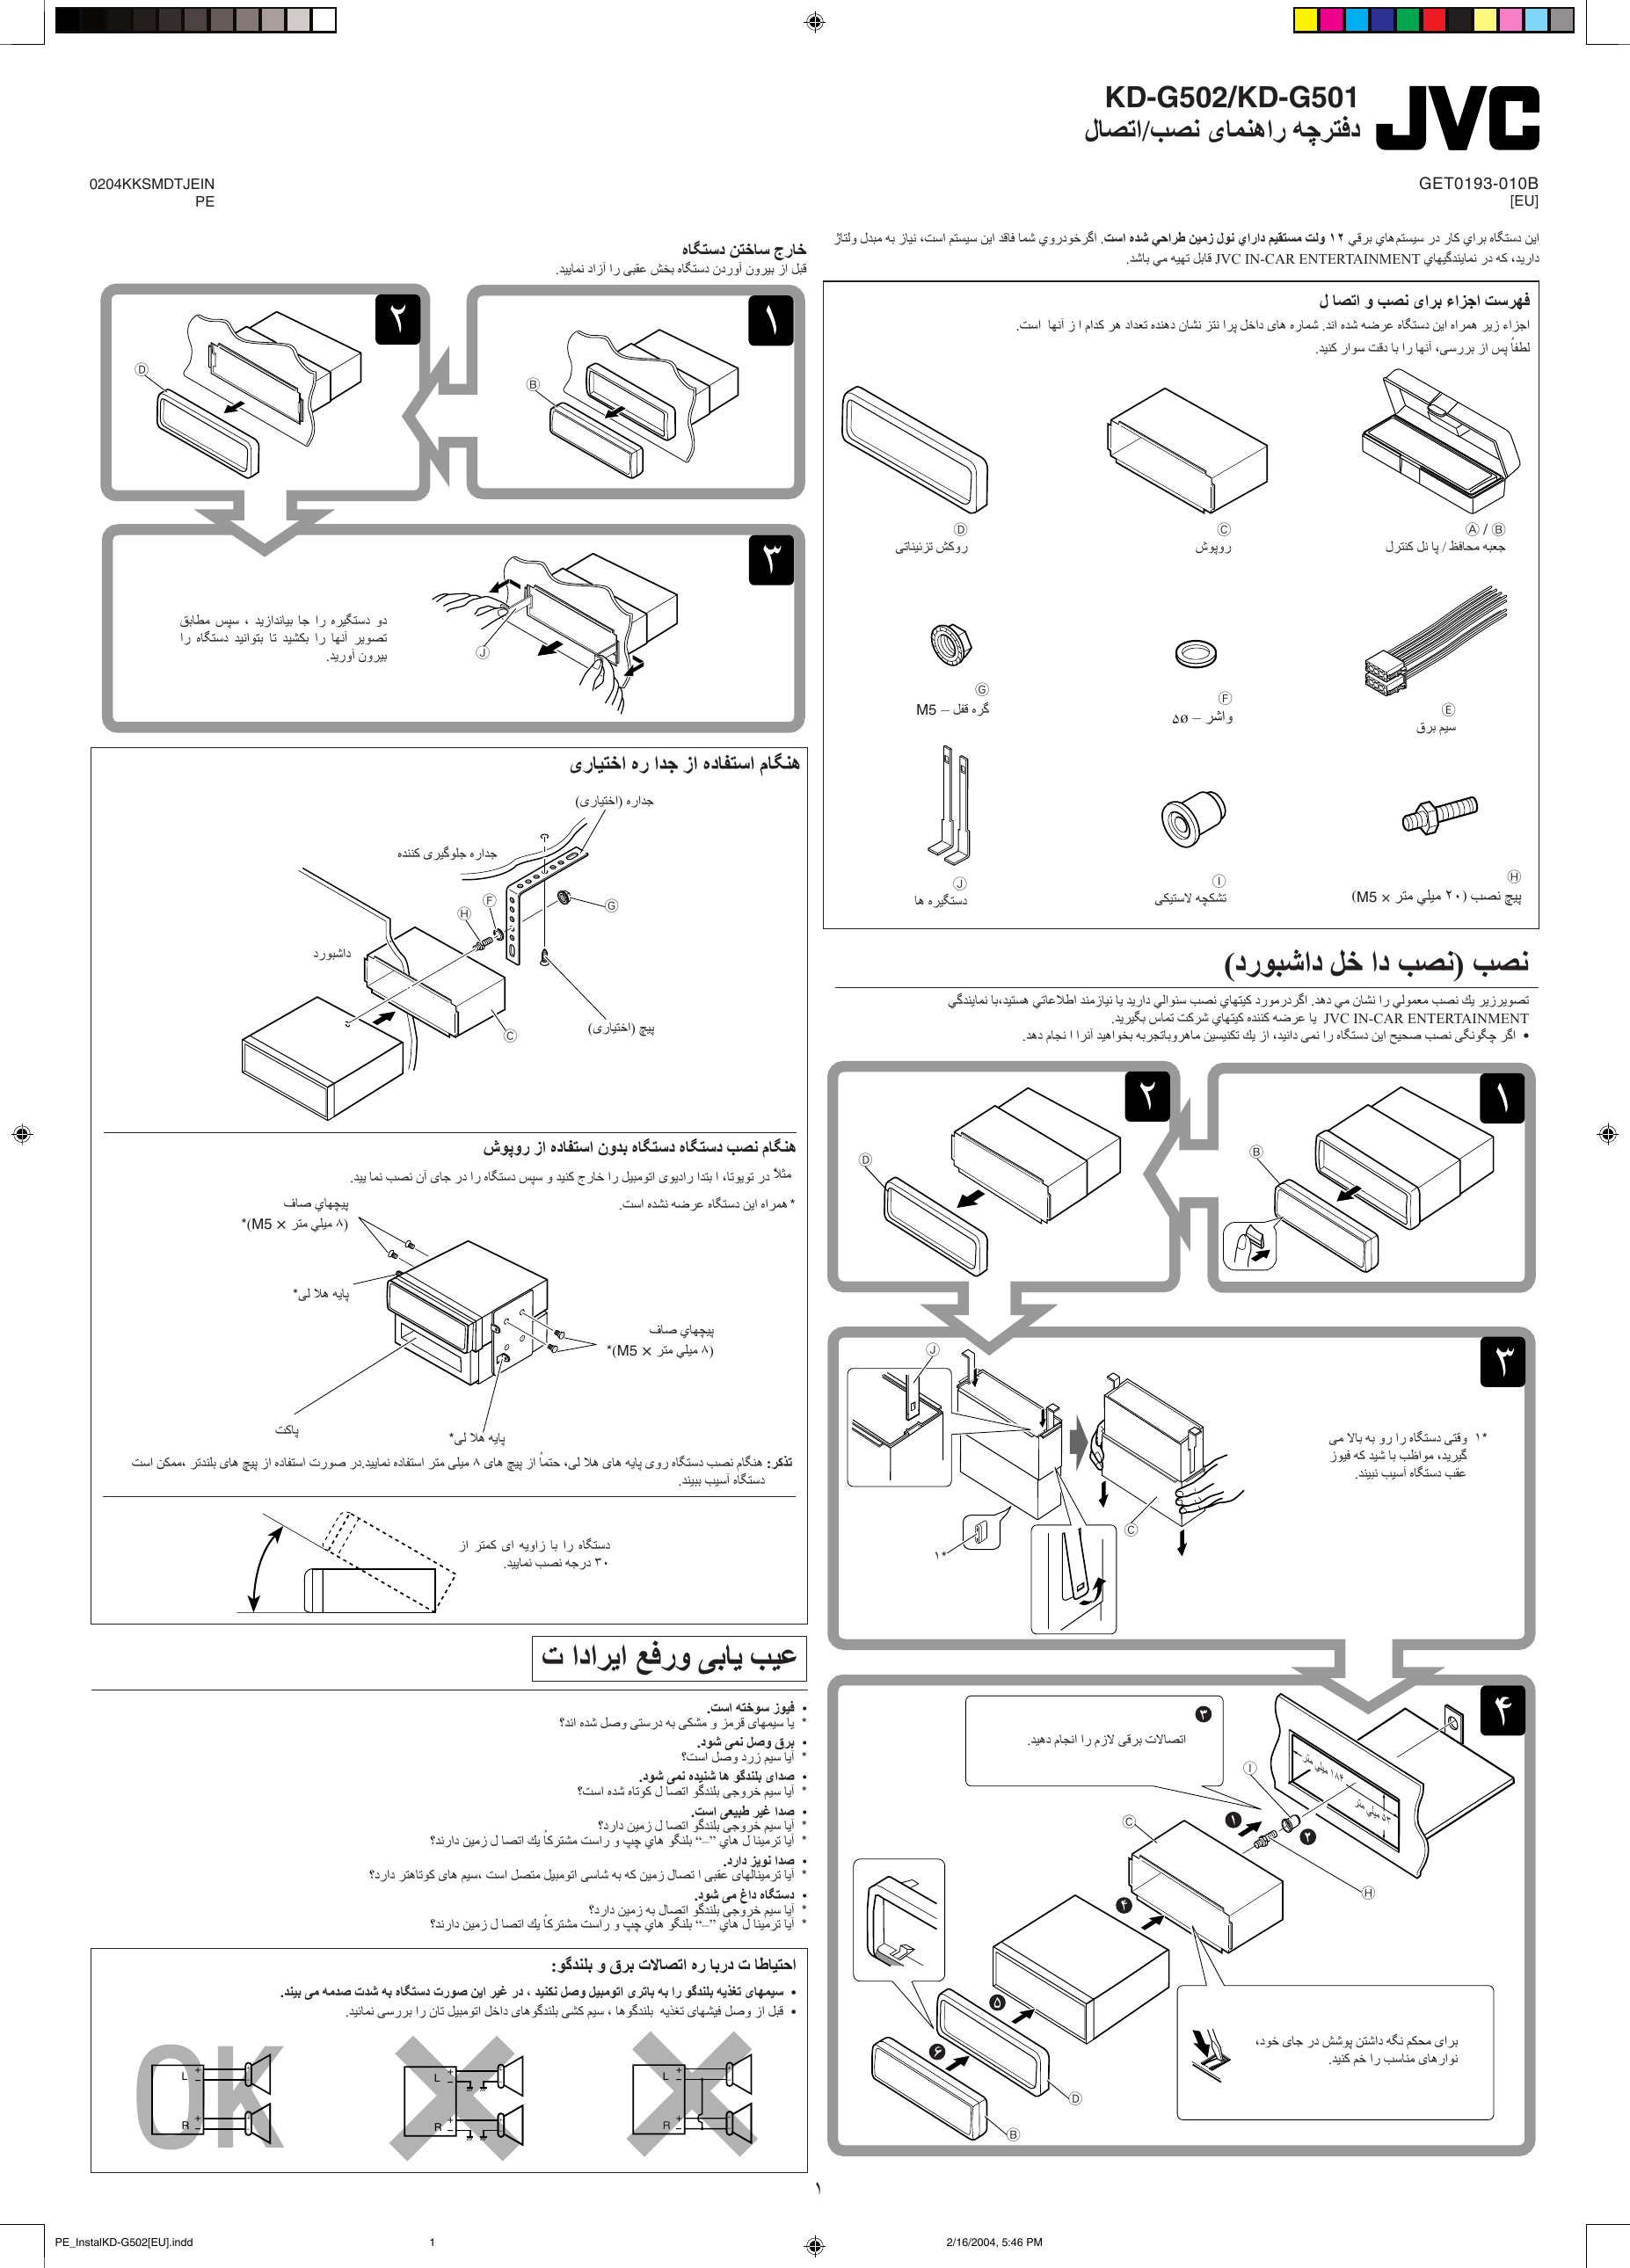 Jvc Kd G502 Wiring Diagram Free Download R540 G501eu Pe Instalkd G502eu User Manual Installation Europe Harness